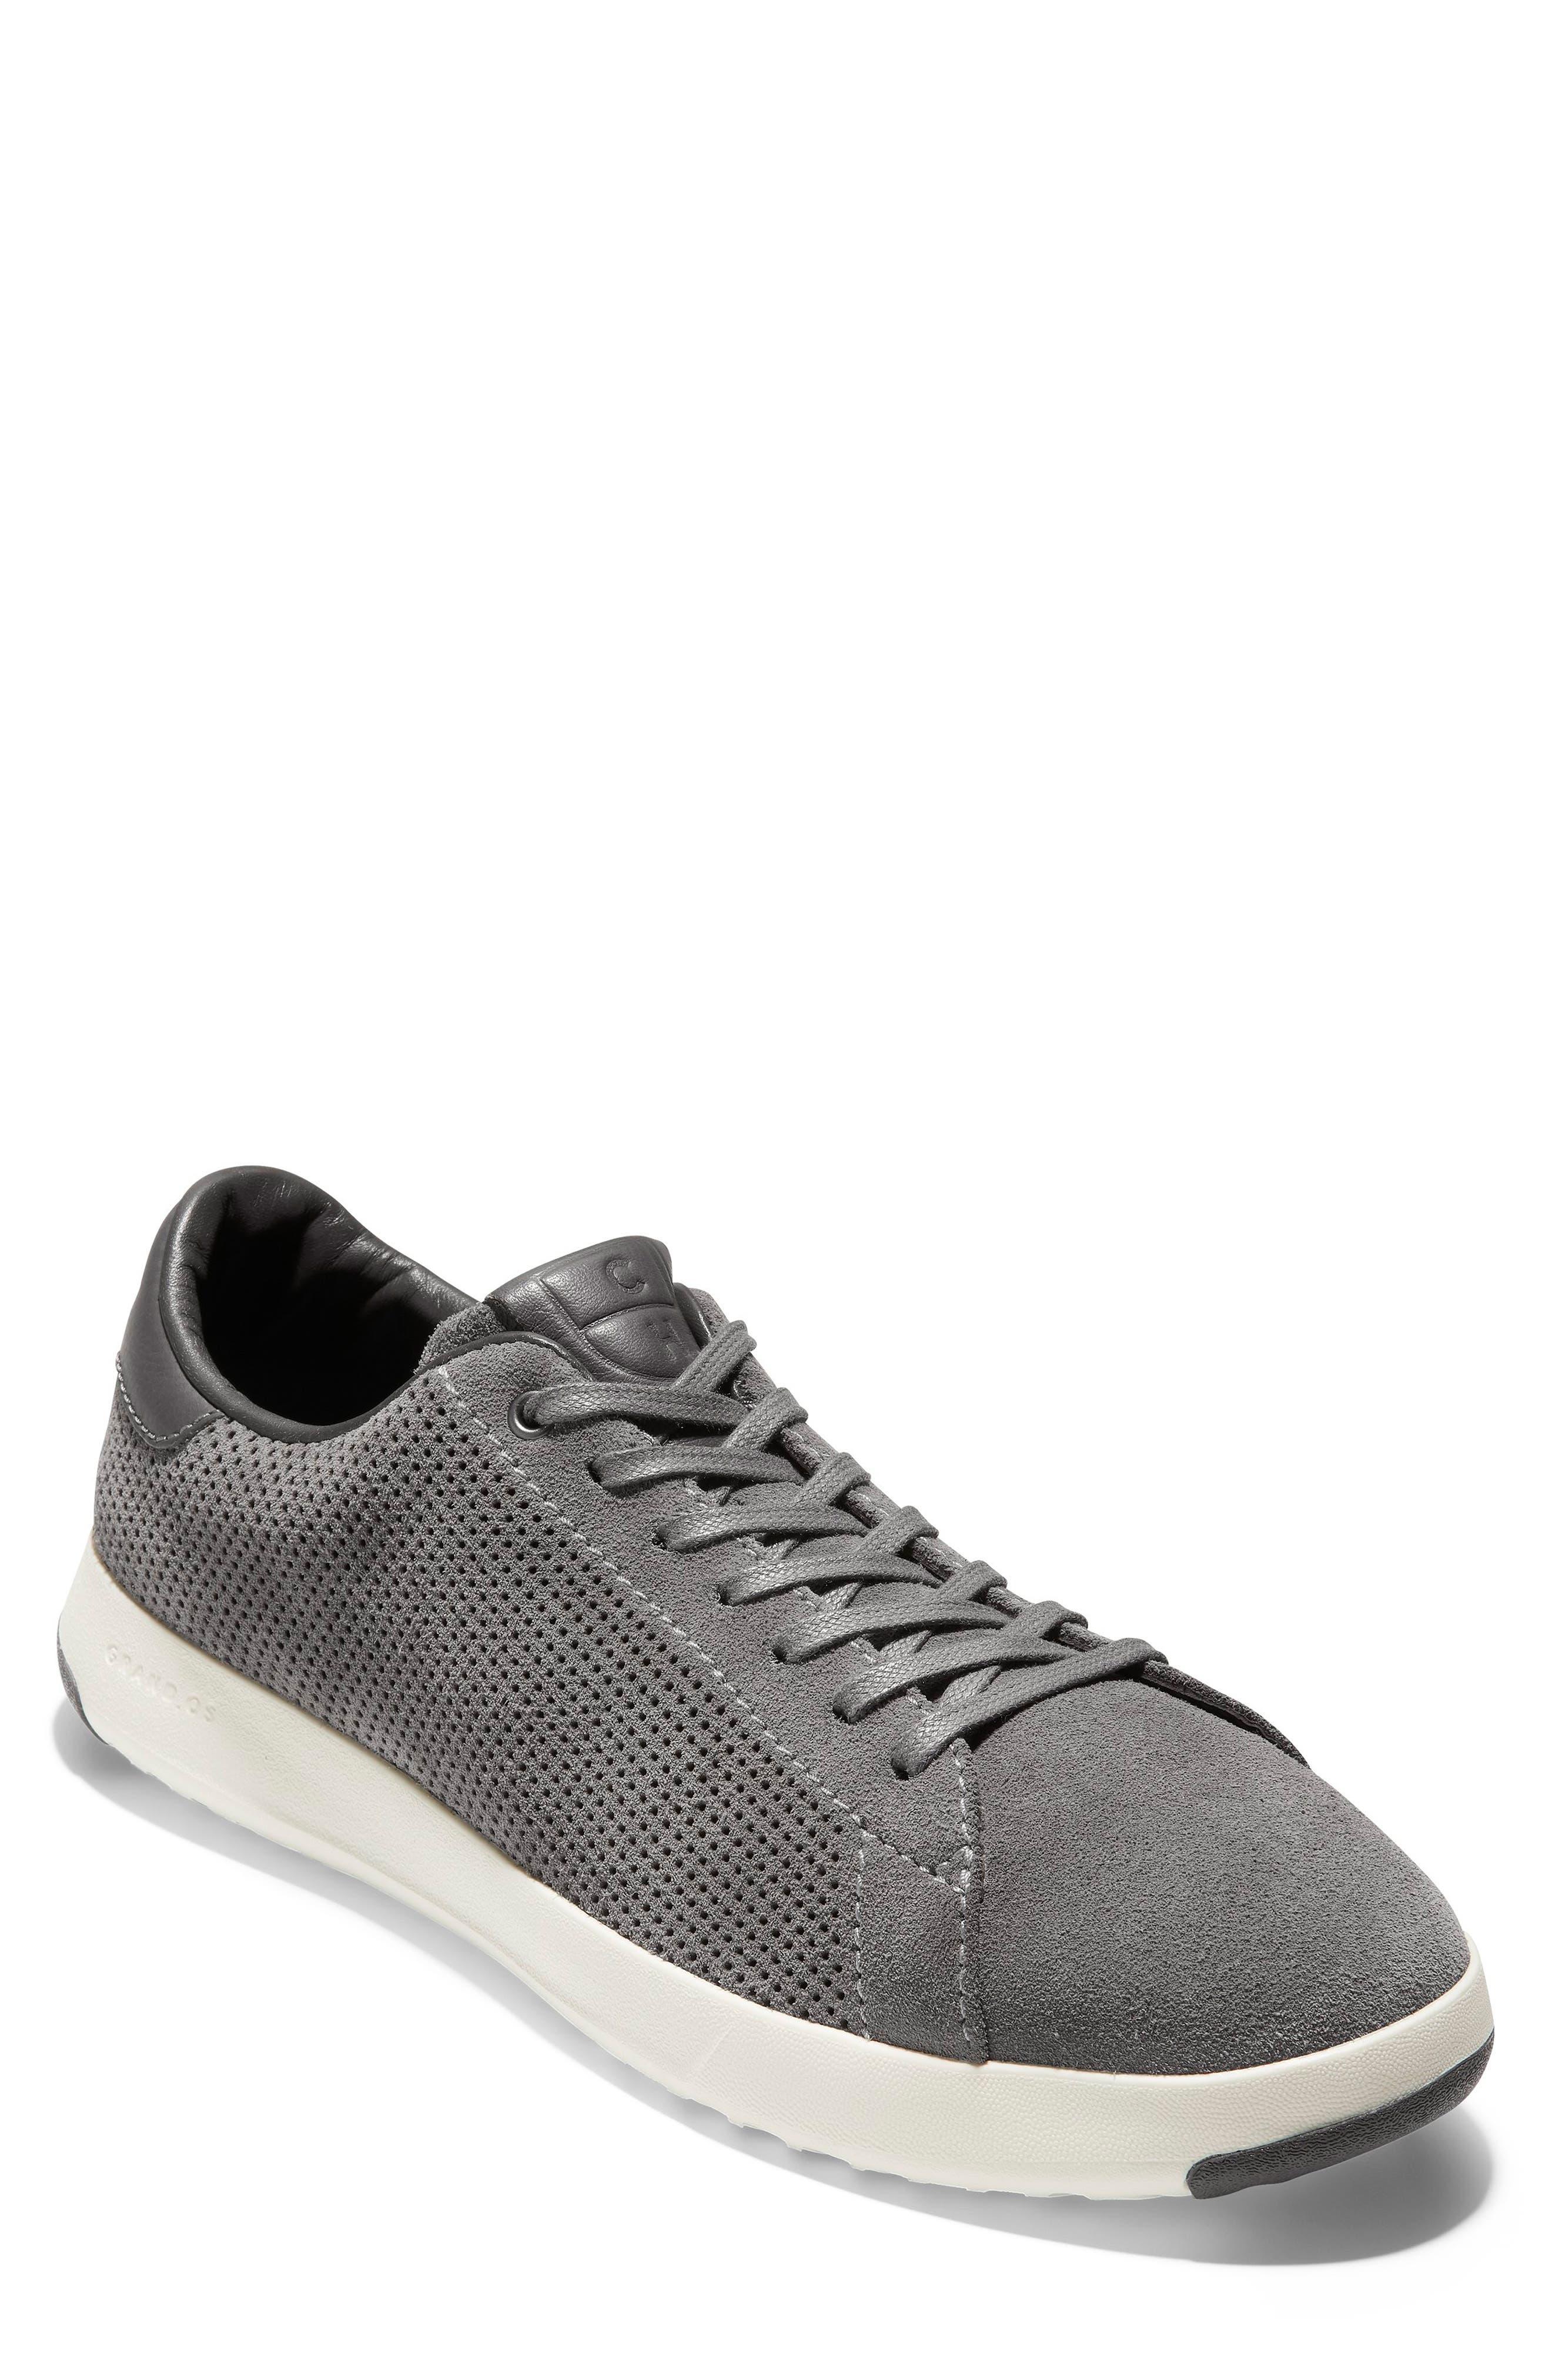 GrandPro Tennis Sneaker,                             Main thumbnail 1, color,                             GREY SUEDE